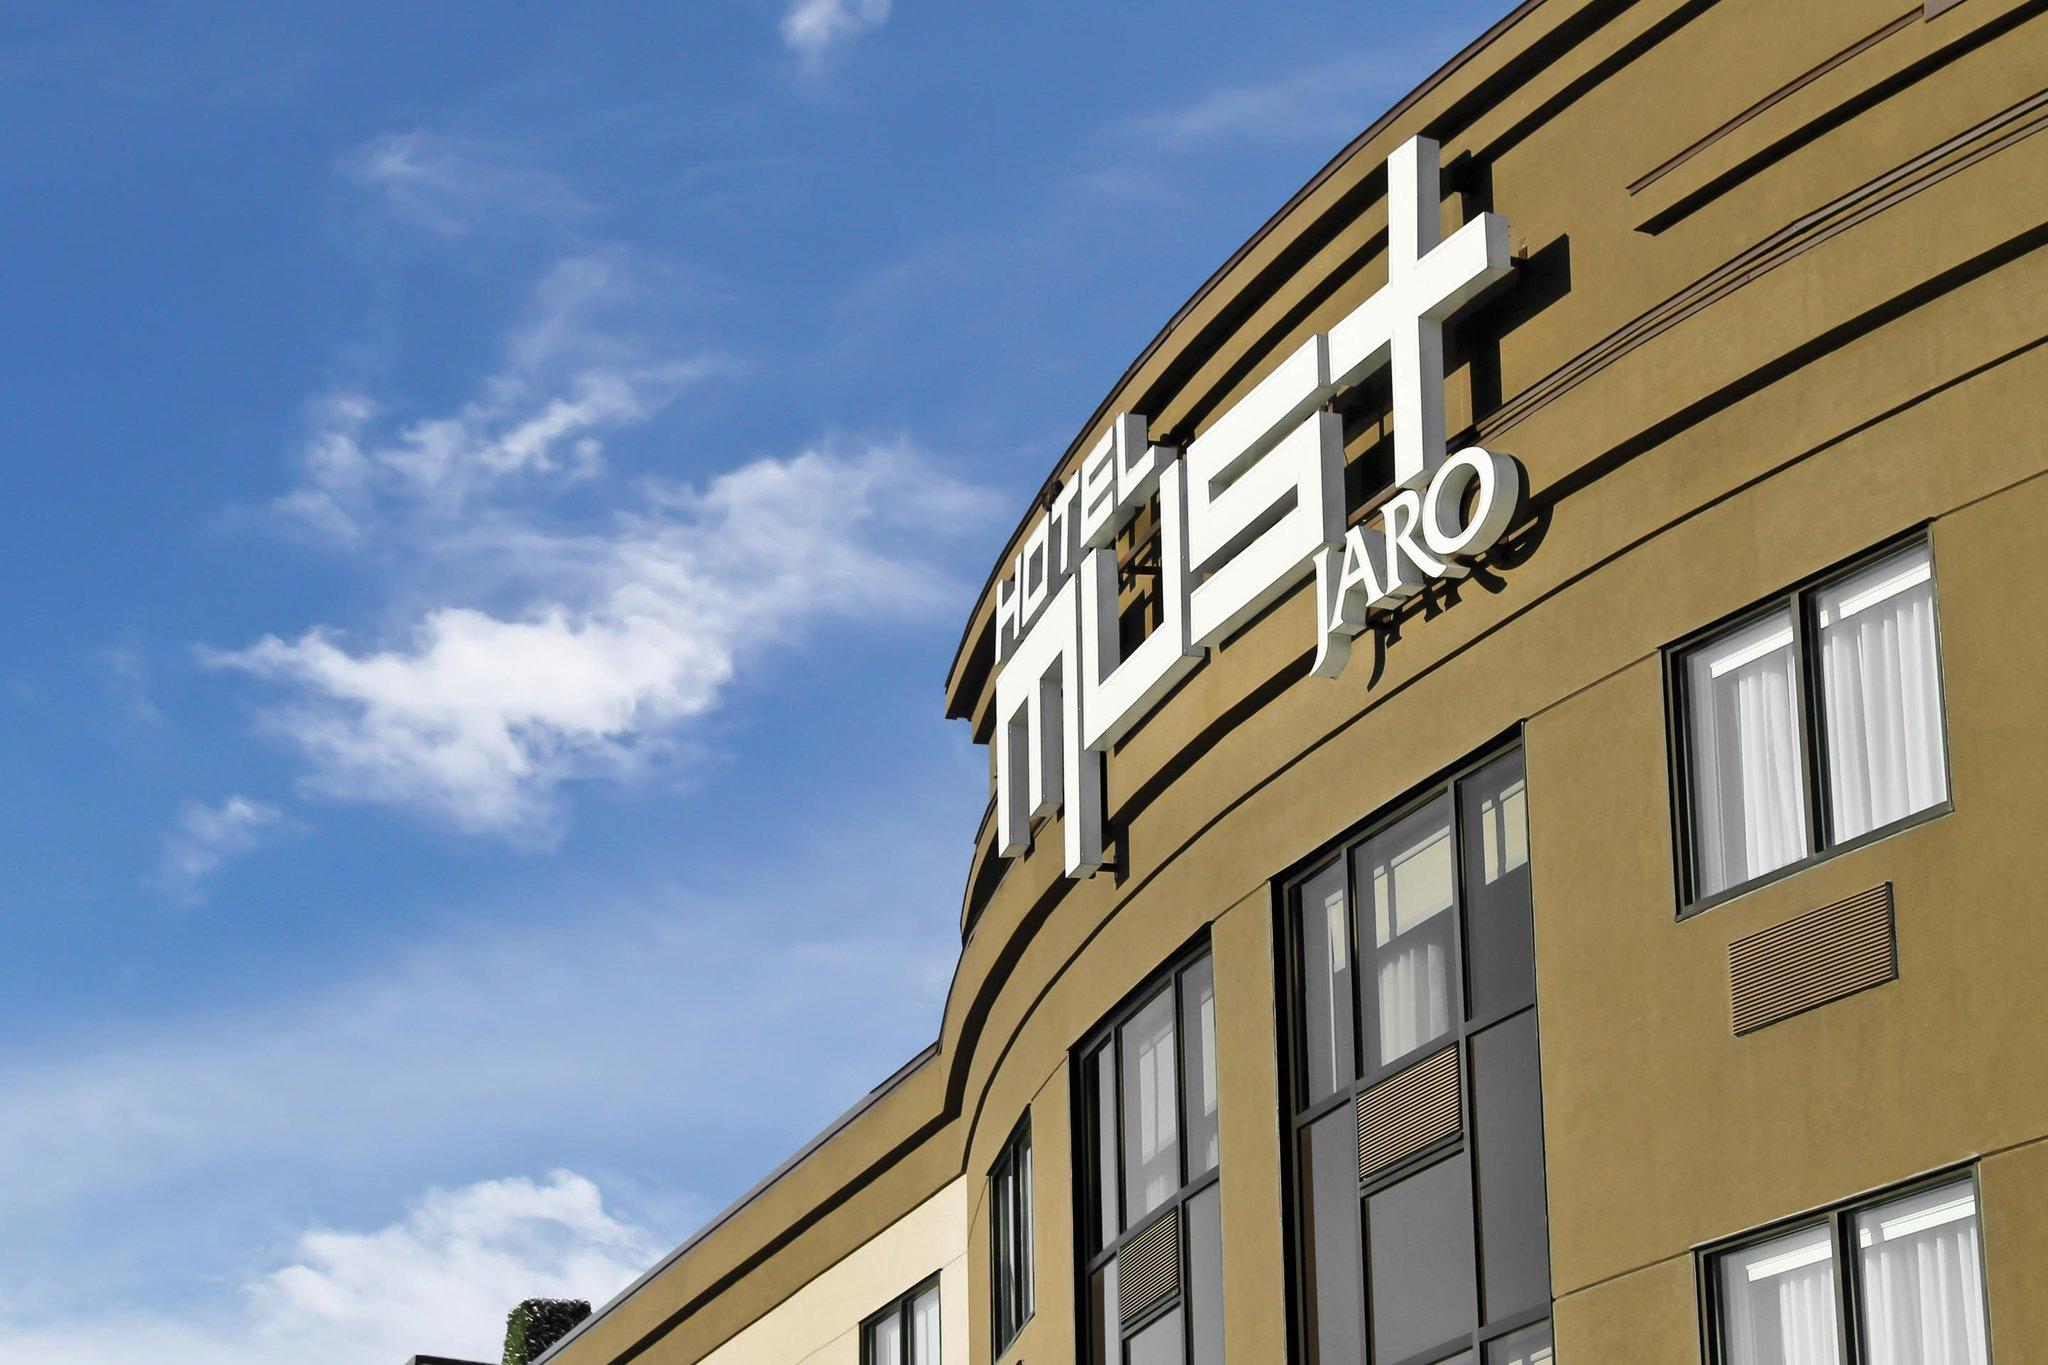 Jaro Hotel Must Quebec